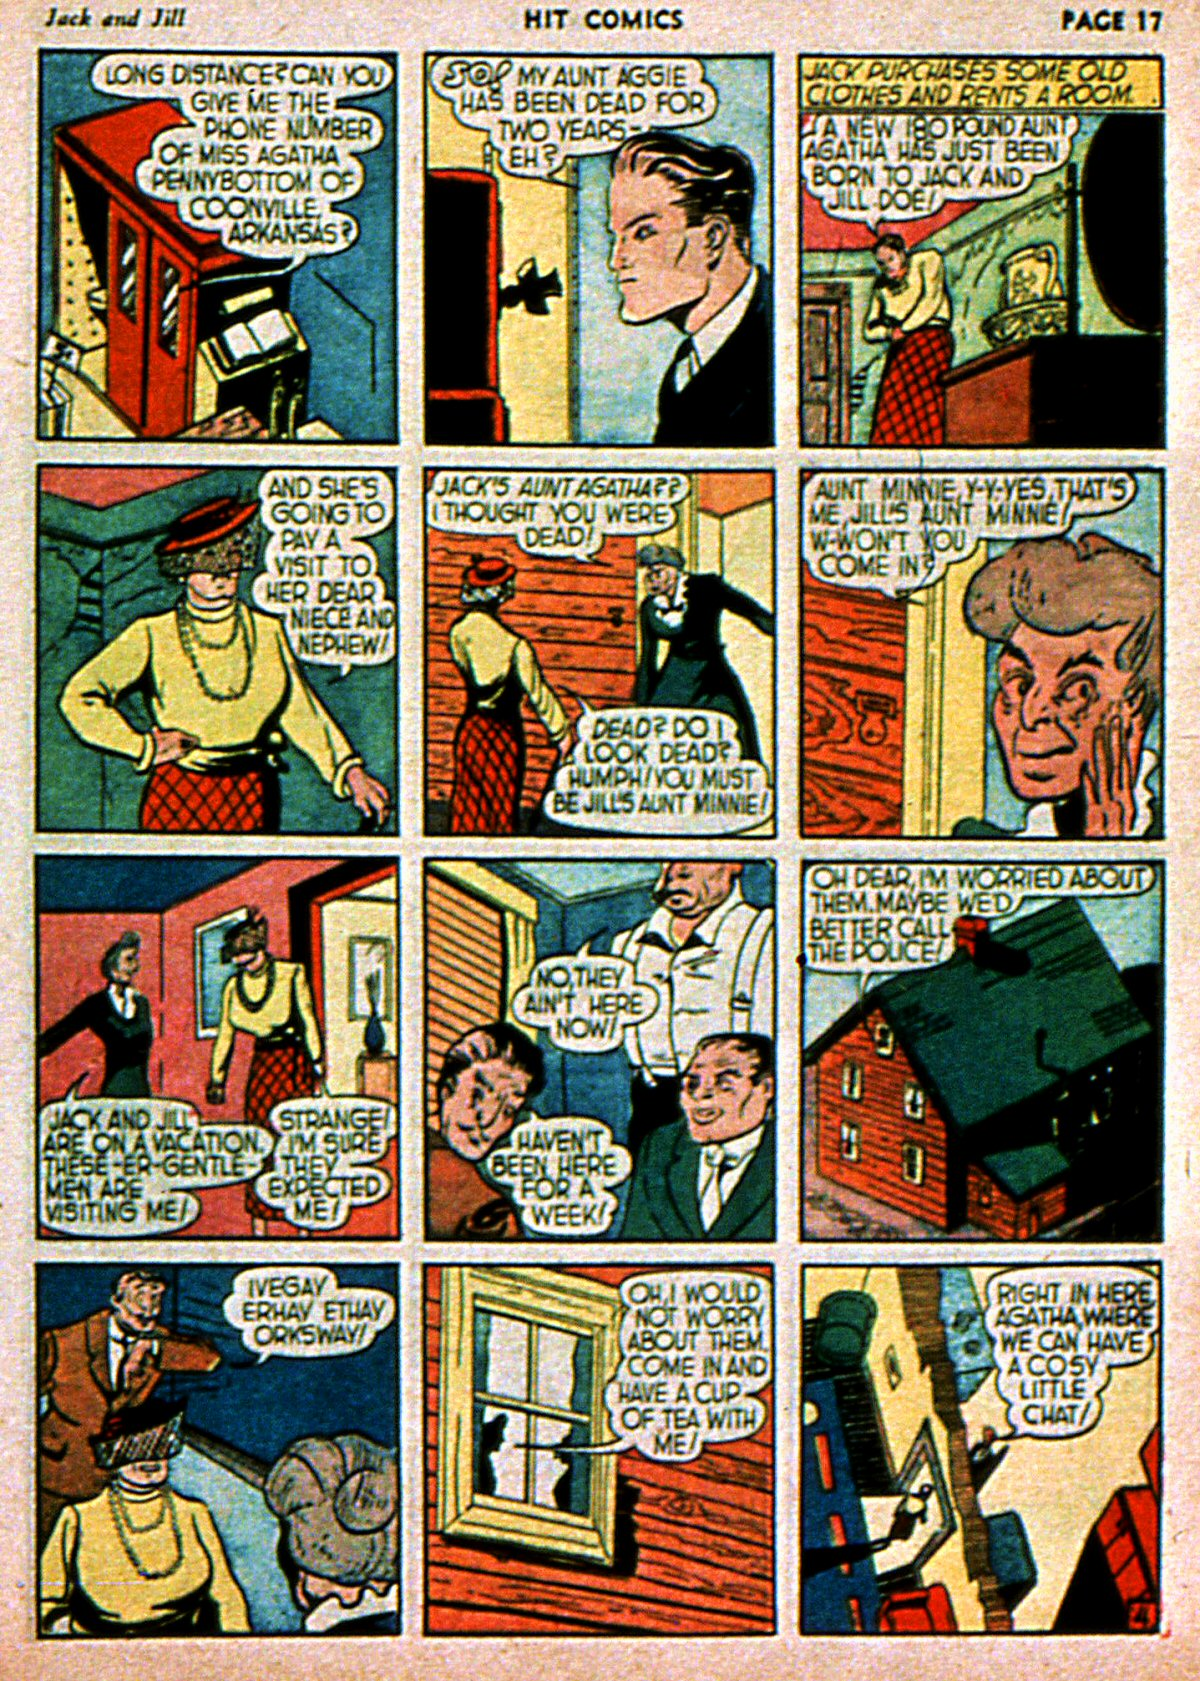 Read online Hit Comics comic -  Issue #3 - 19